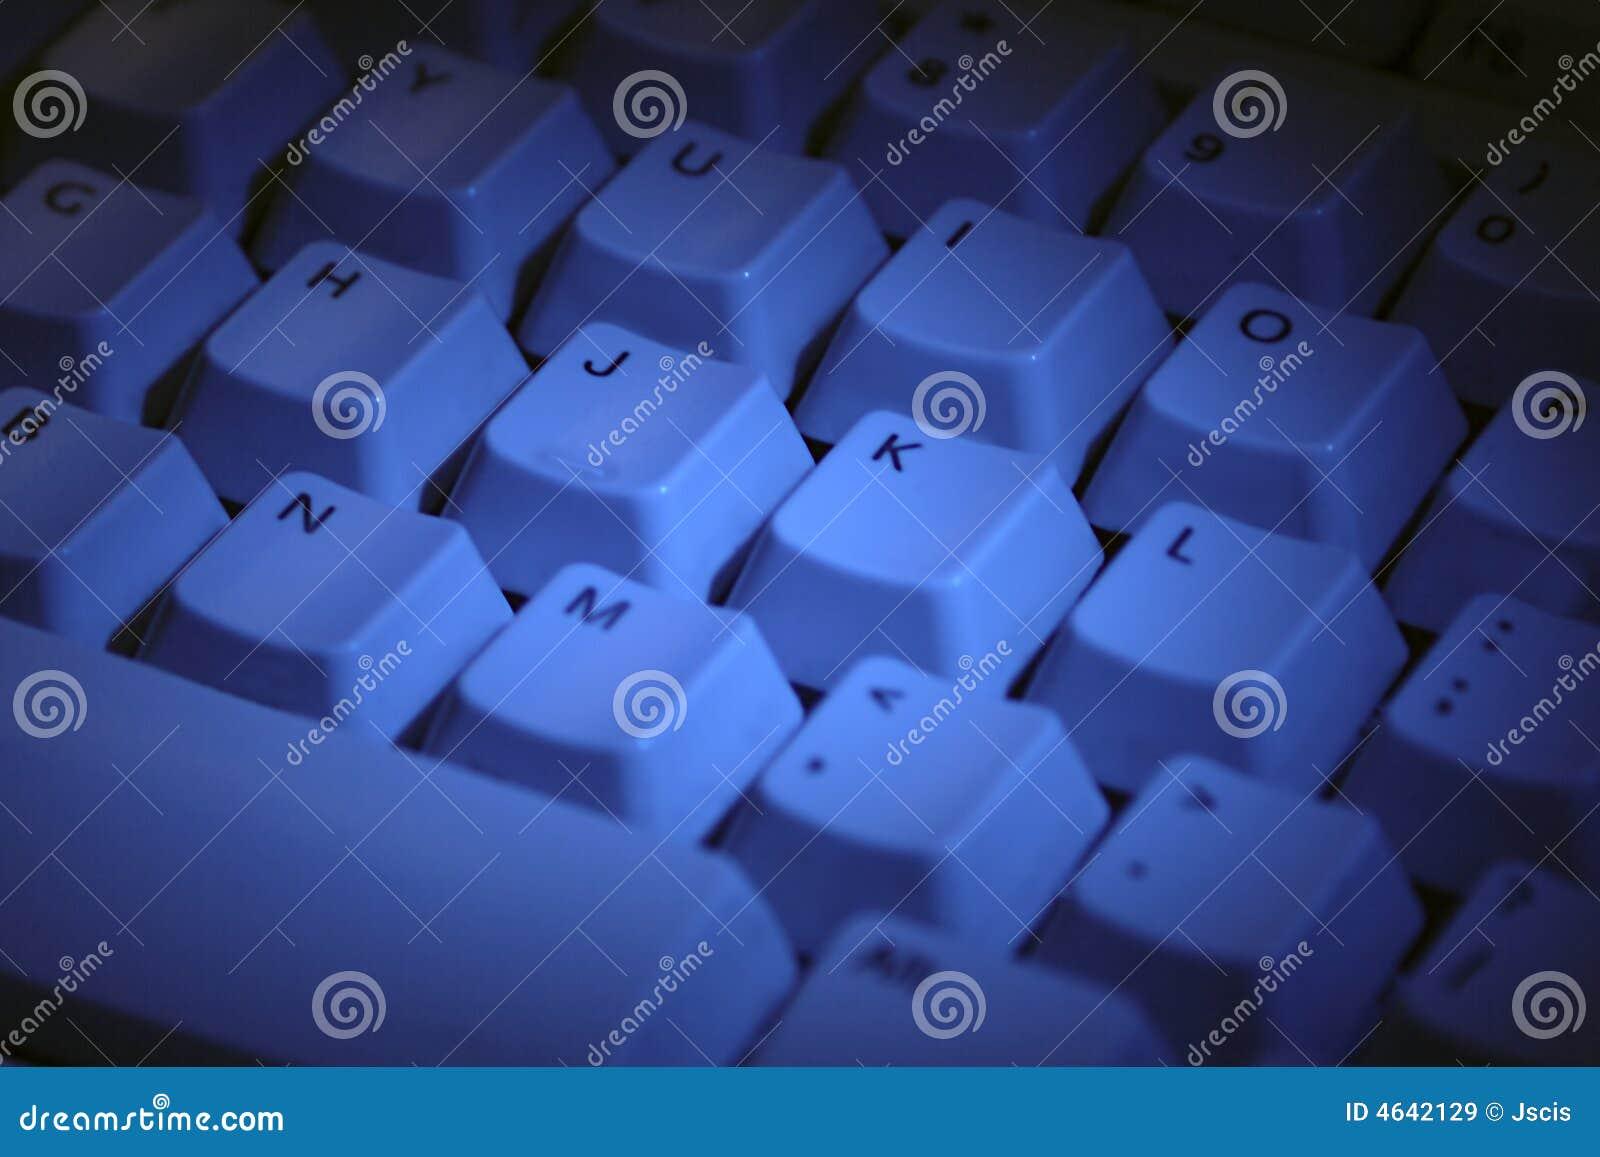 Teclado de computador no azul